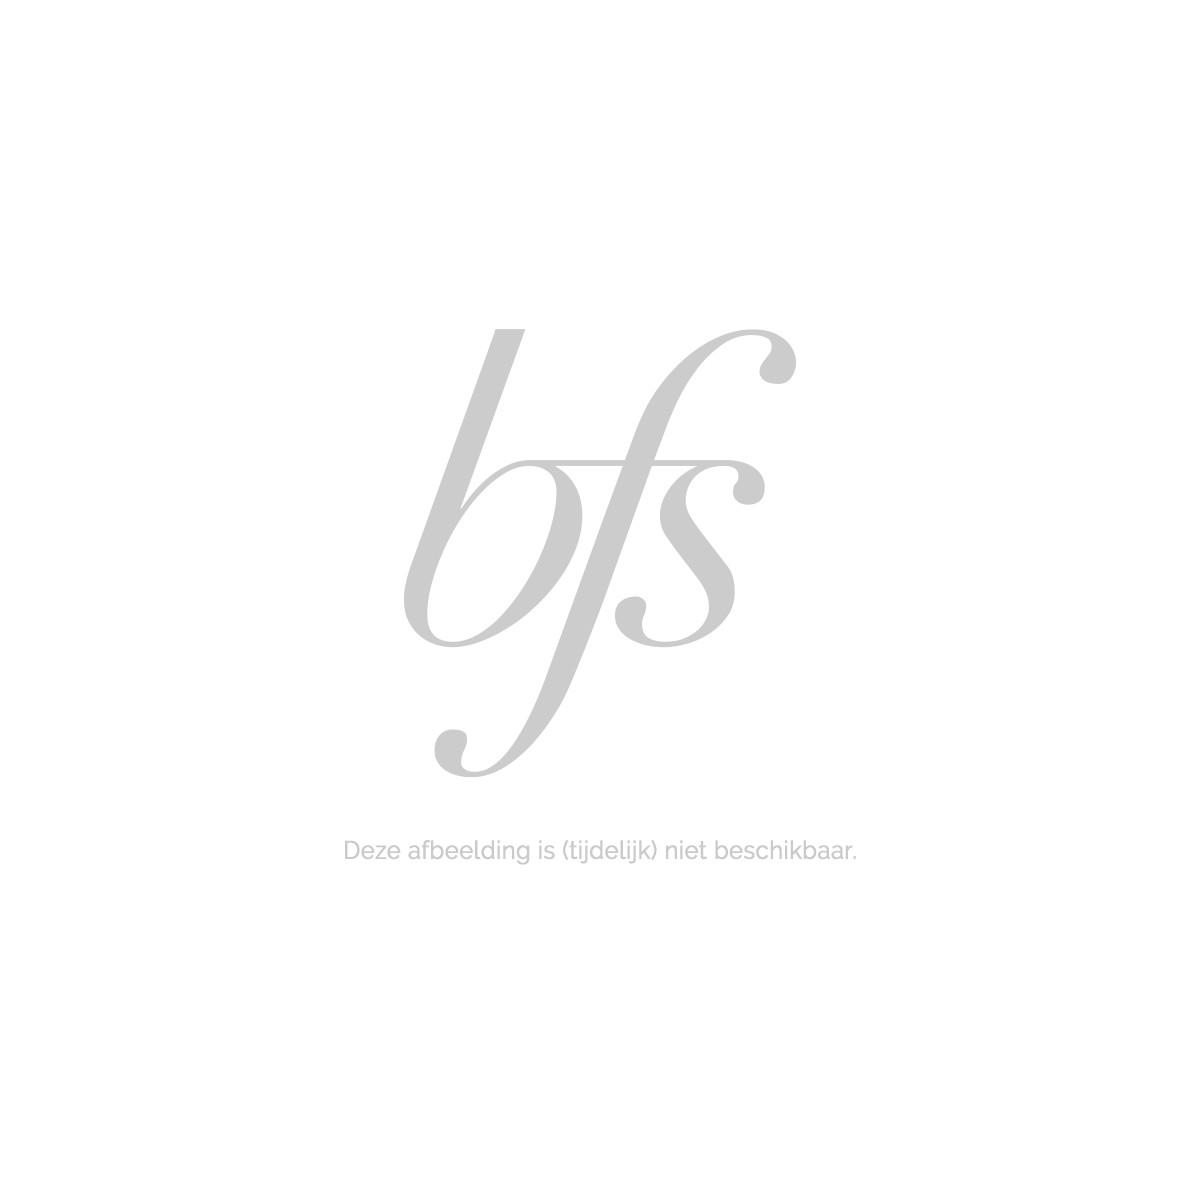 michael kors wonderlust sensual essence eau de parfum 30 ml g nstig hautpflege kaufen. Black Bedroom Furniture Sets. Home Design Ideas